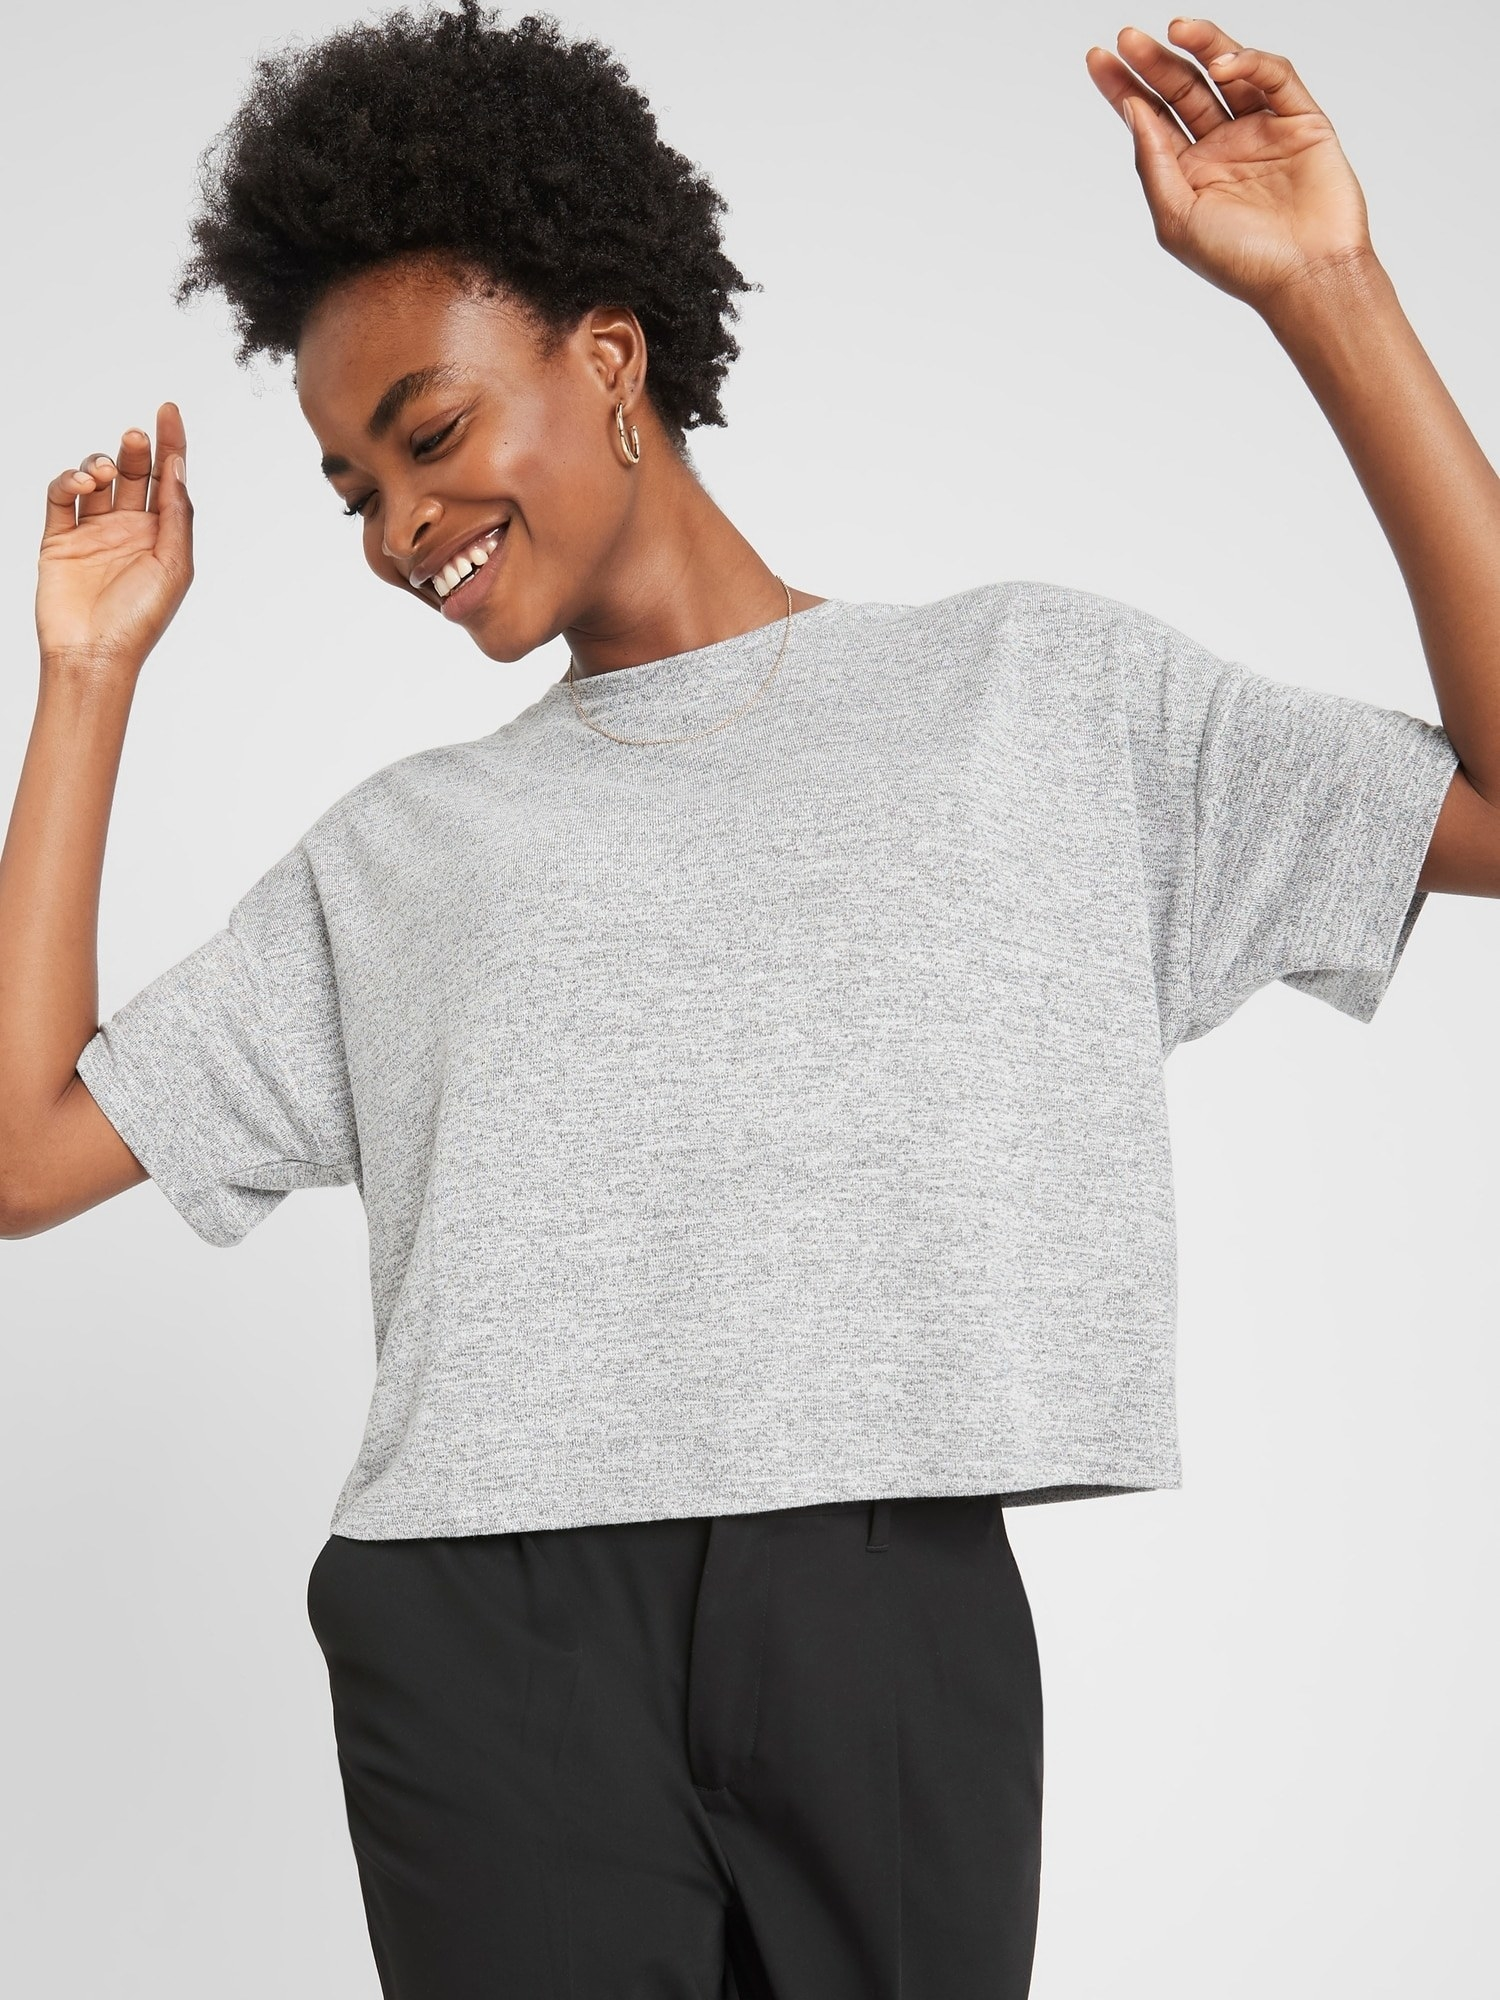 Model in the grey short-sleeve tee